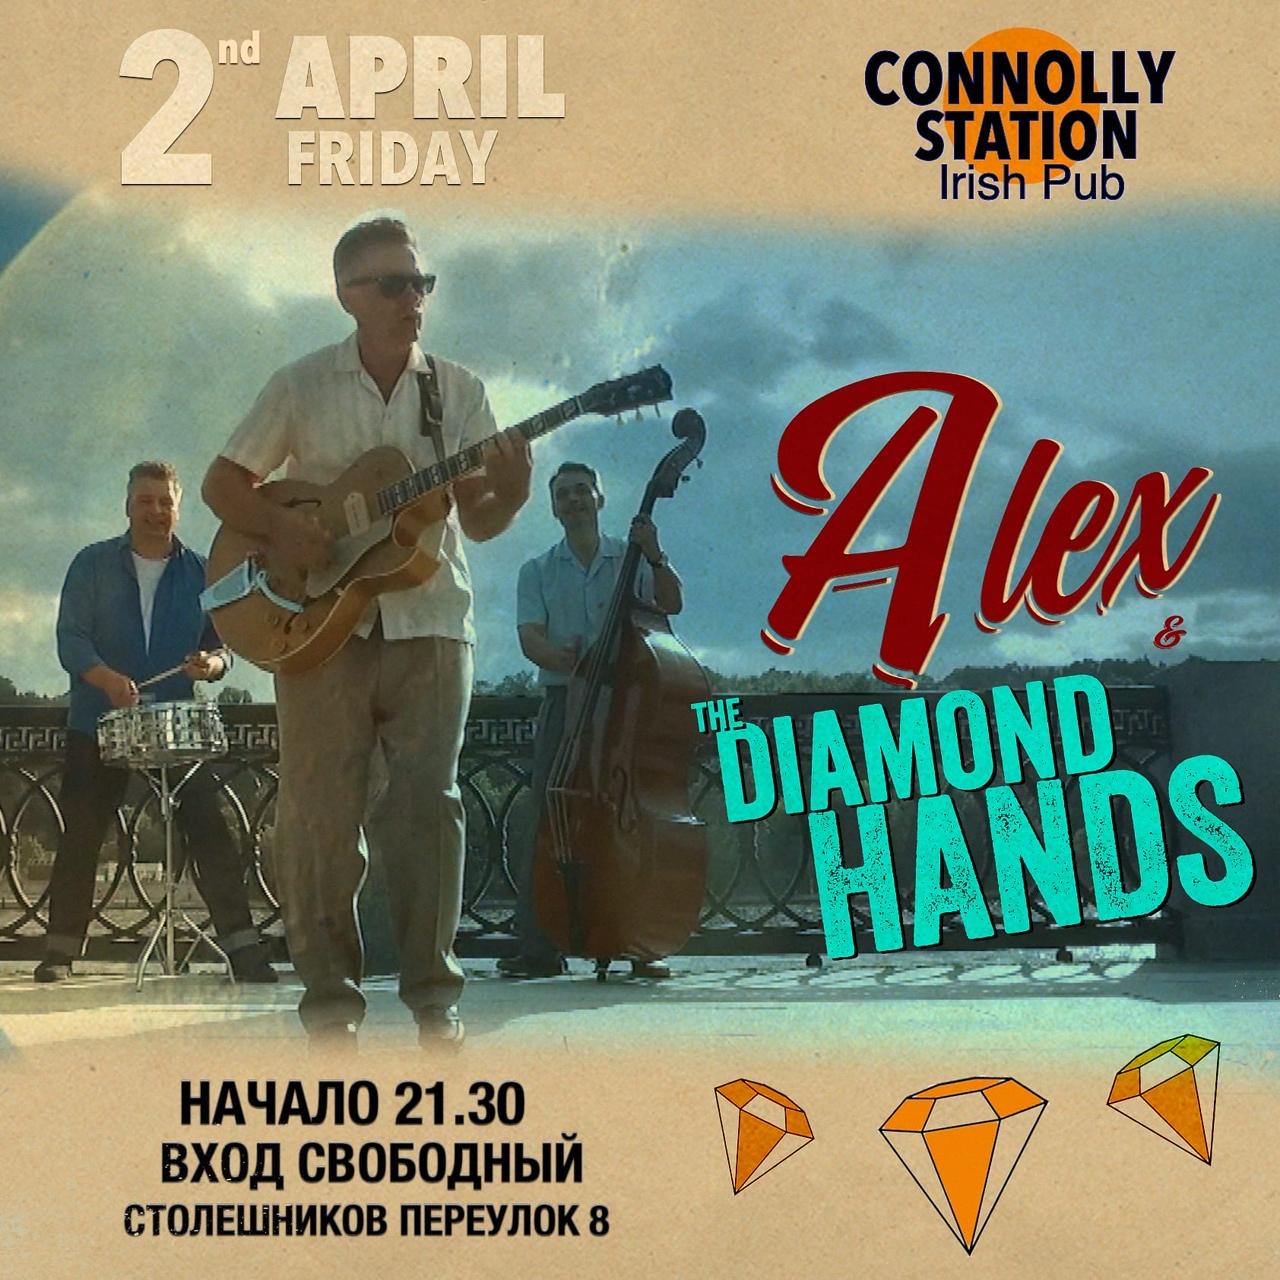 02.04 Alex & The Diamond Hands в пабе Connolly Station!